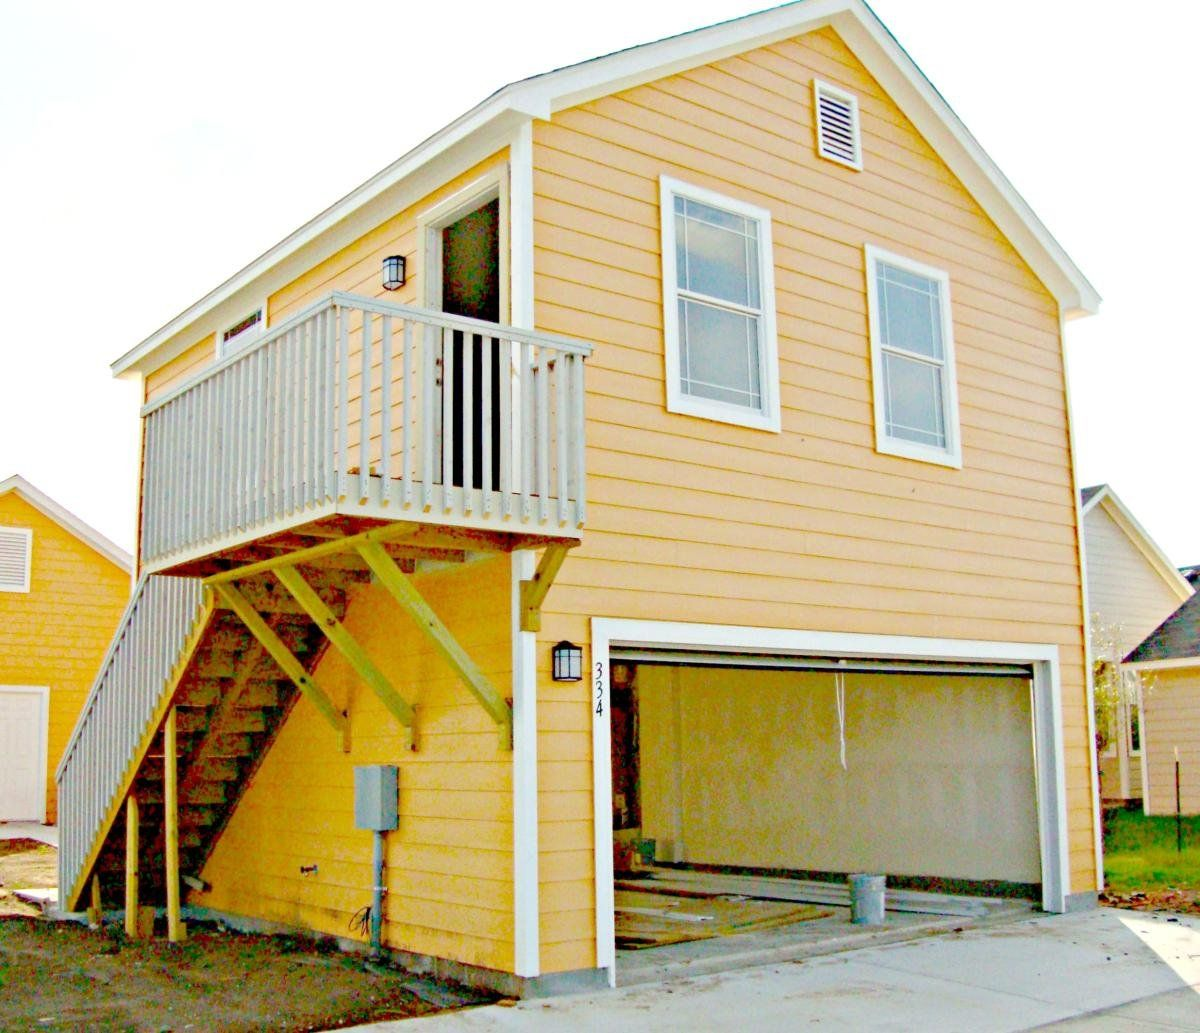 Garage Apartments For Rent Http Undhimmi Com Garage Apartments For Rent 2892 04 12 Html Renting A House Garage Apartments Apartments For Rent